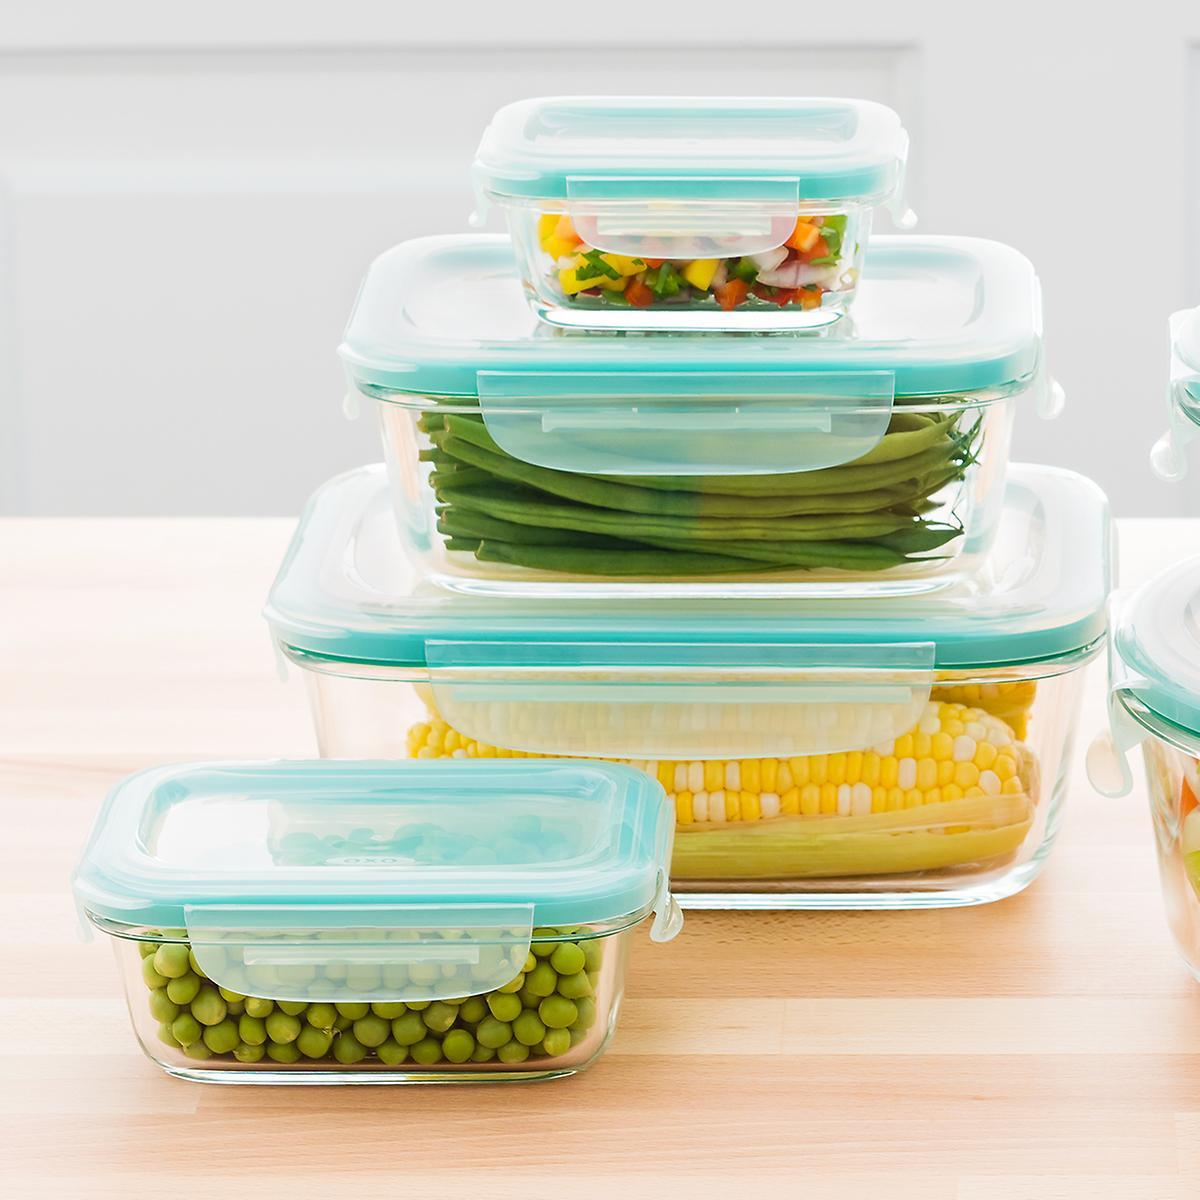 OXO Good Grips 8-Piece Smart Seal Rectangular Glass Food Storage Set